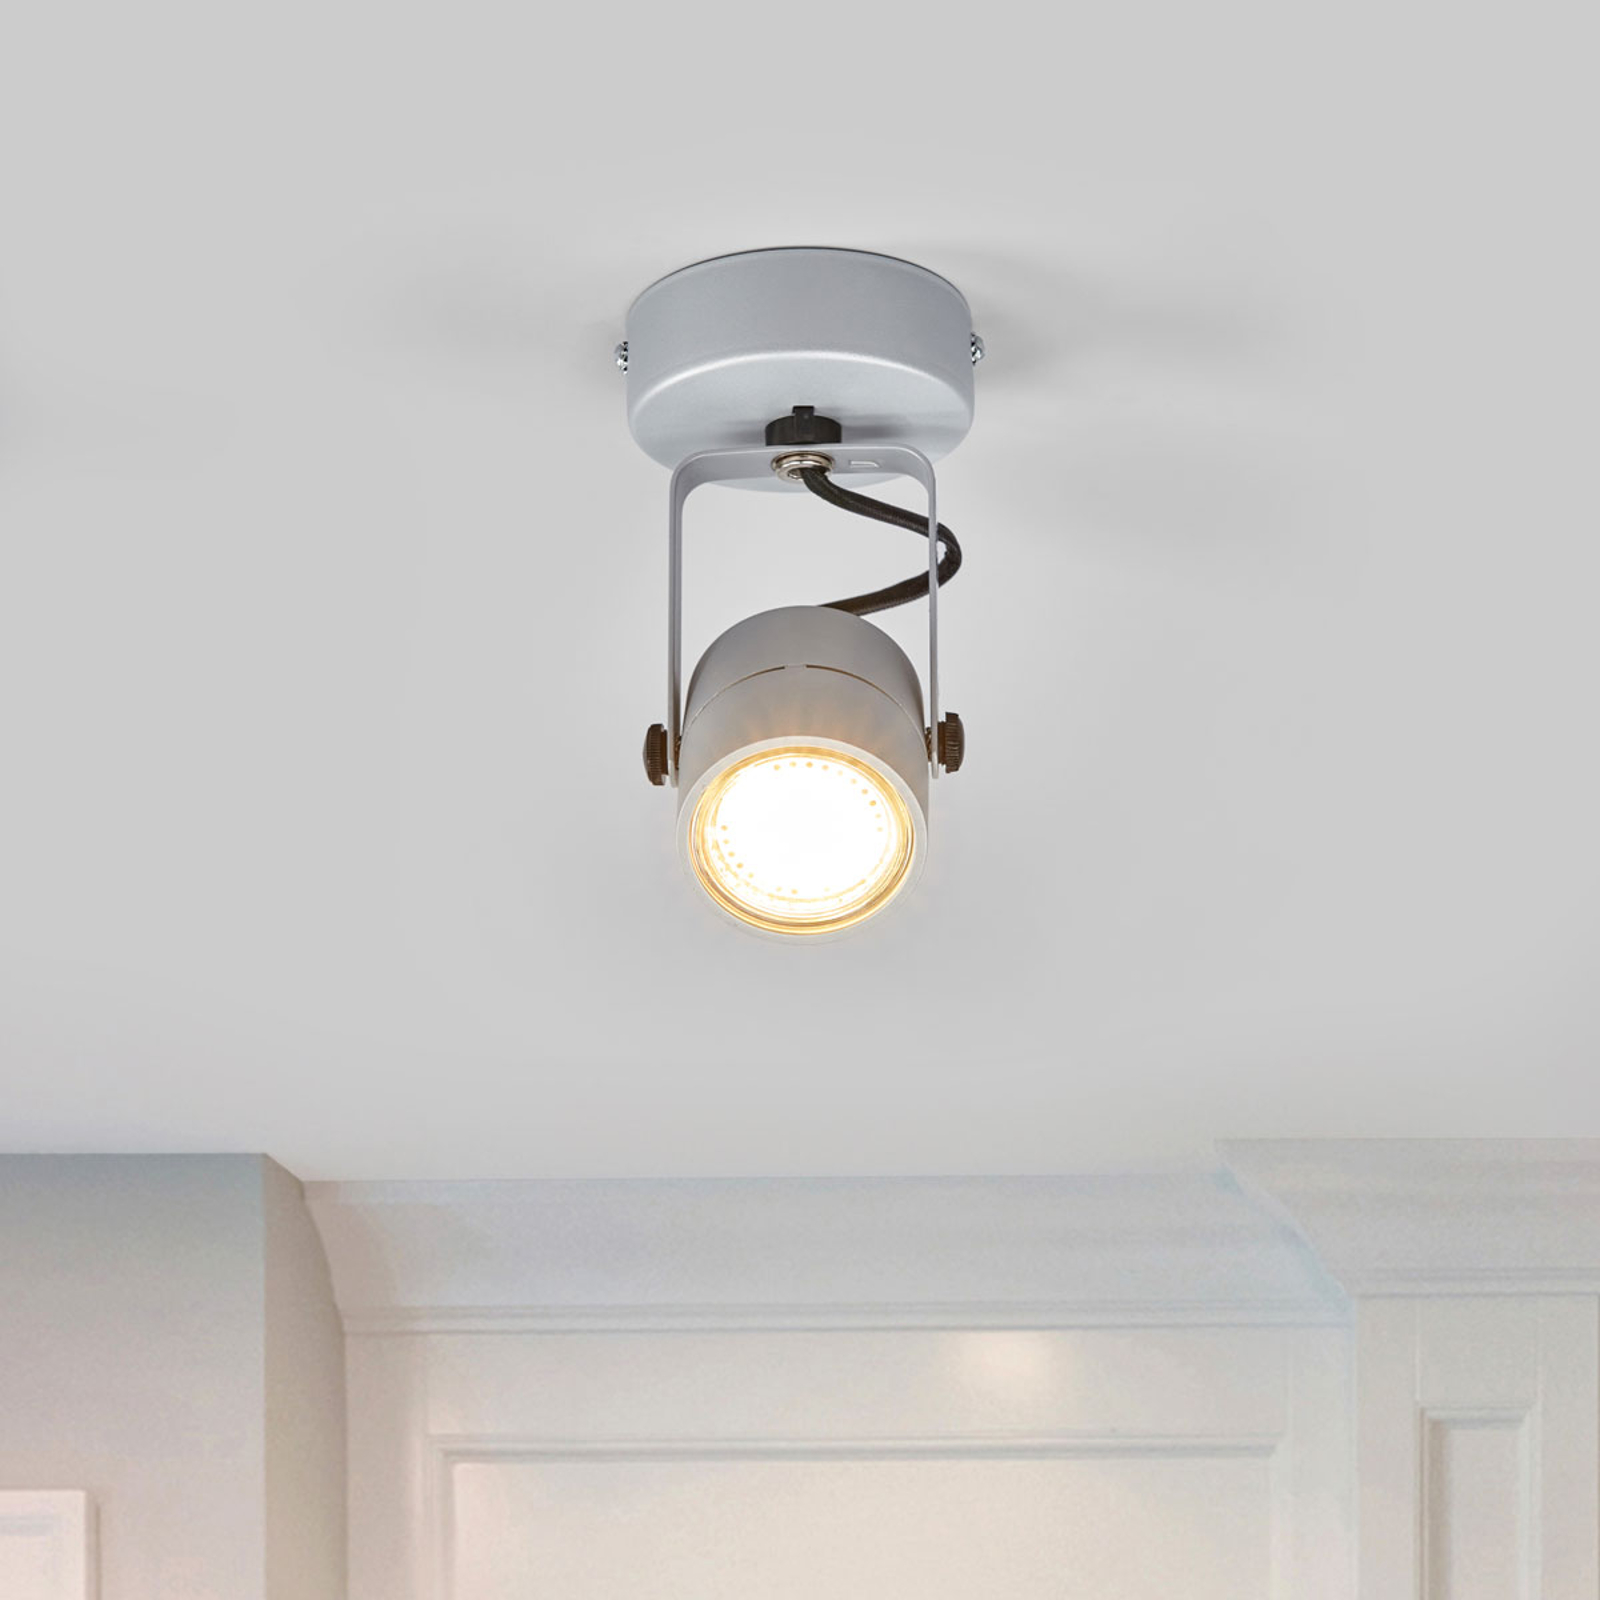 Wand- & plafondlamp SPOT 79 230V zilvergrijs